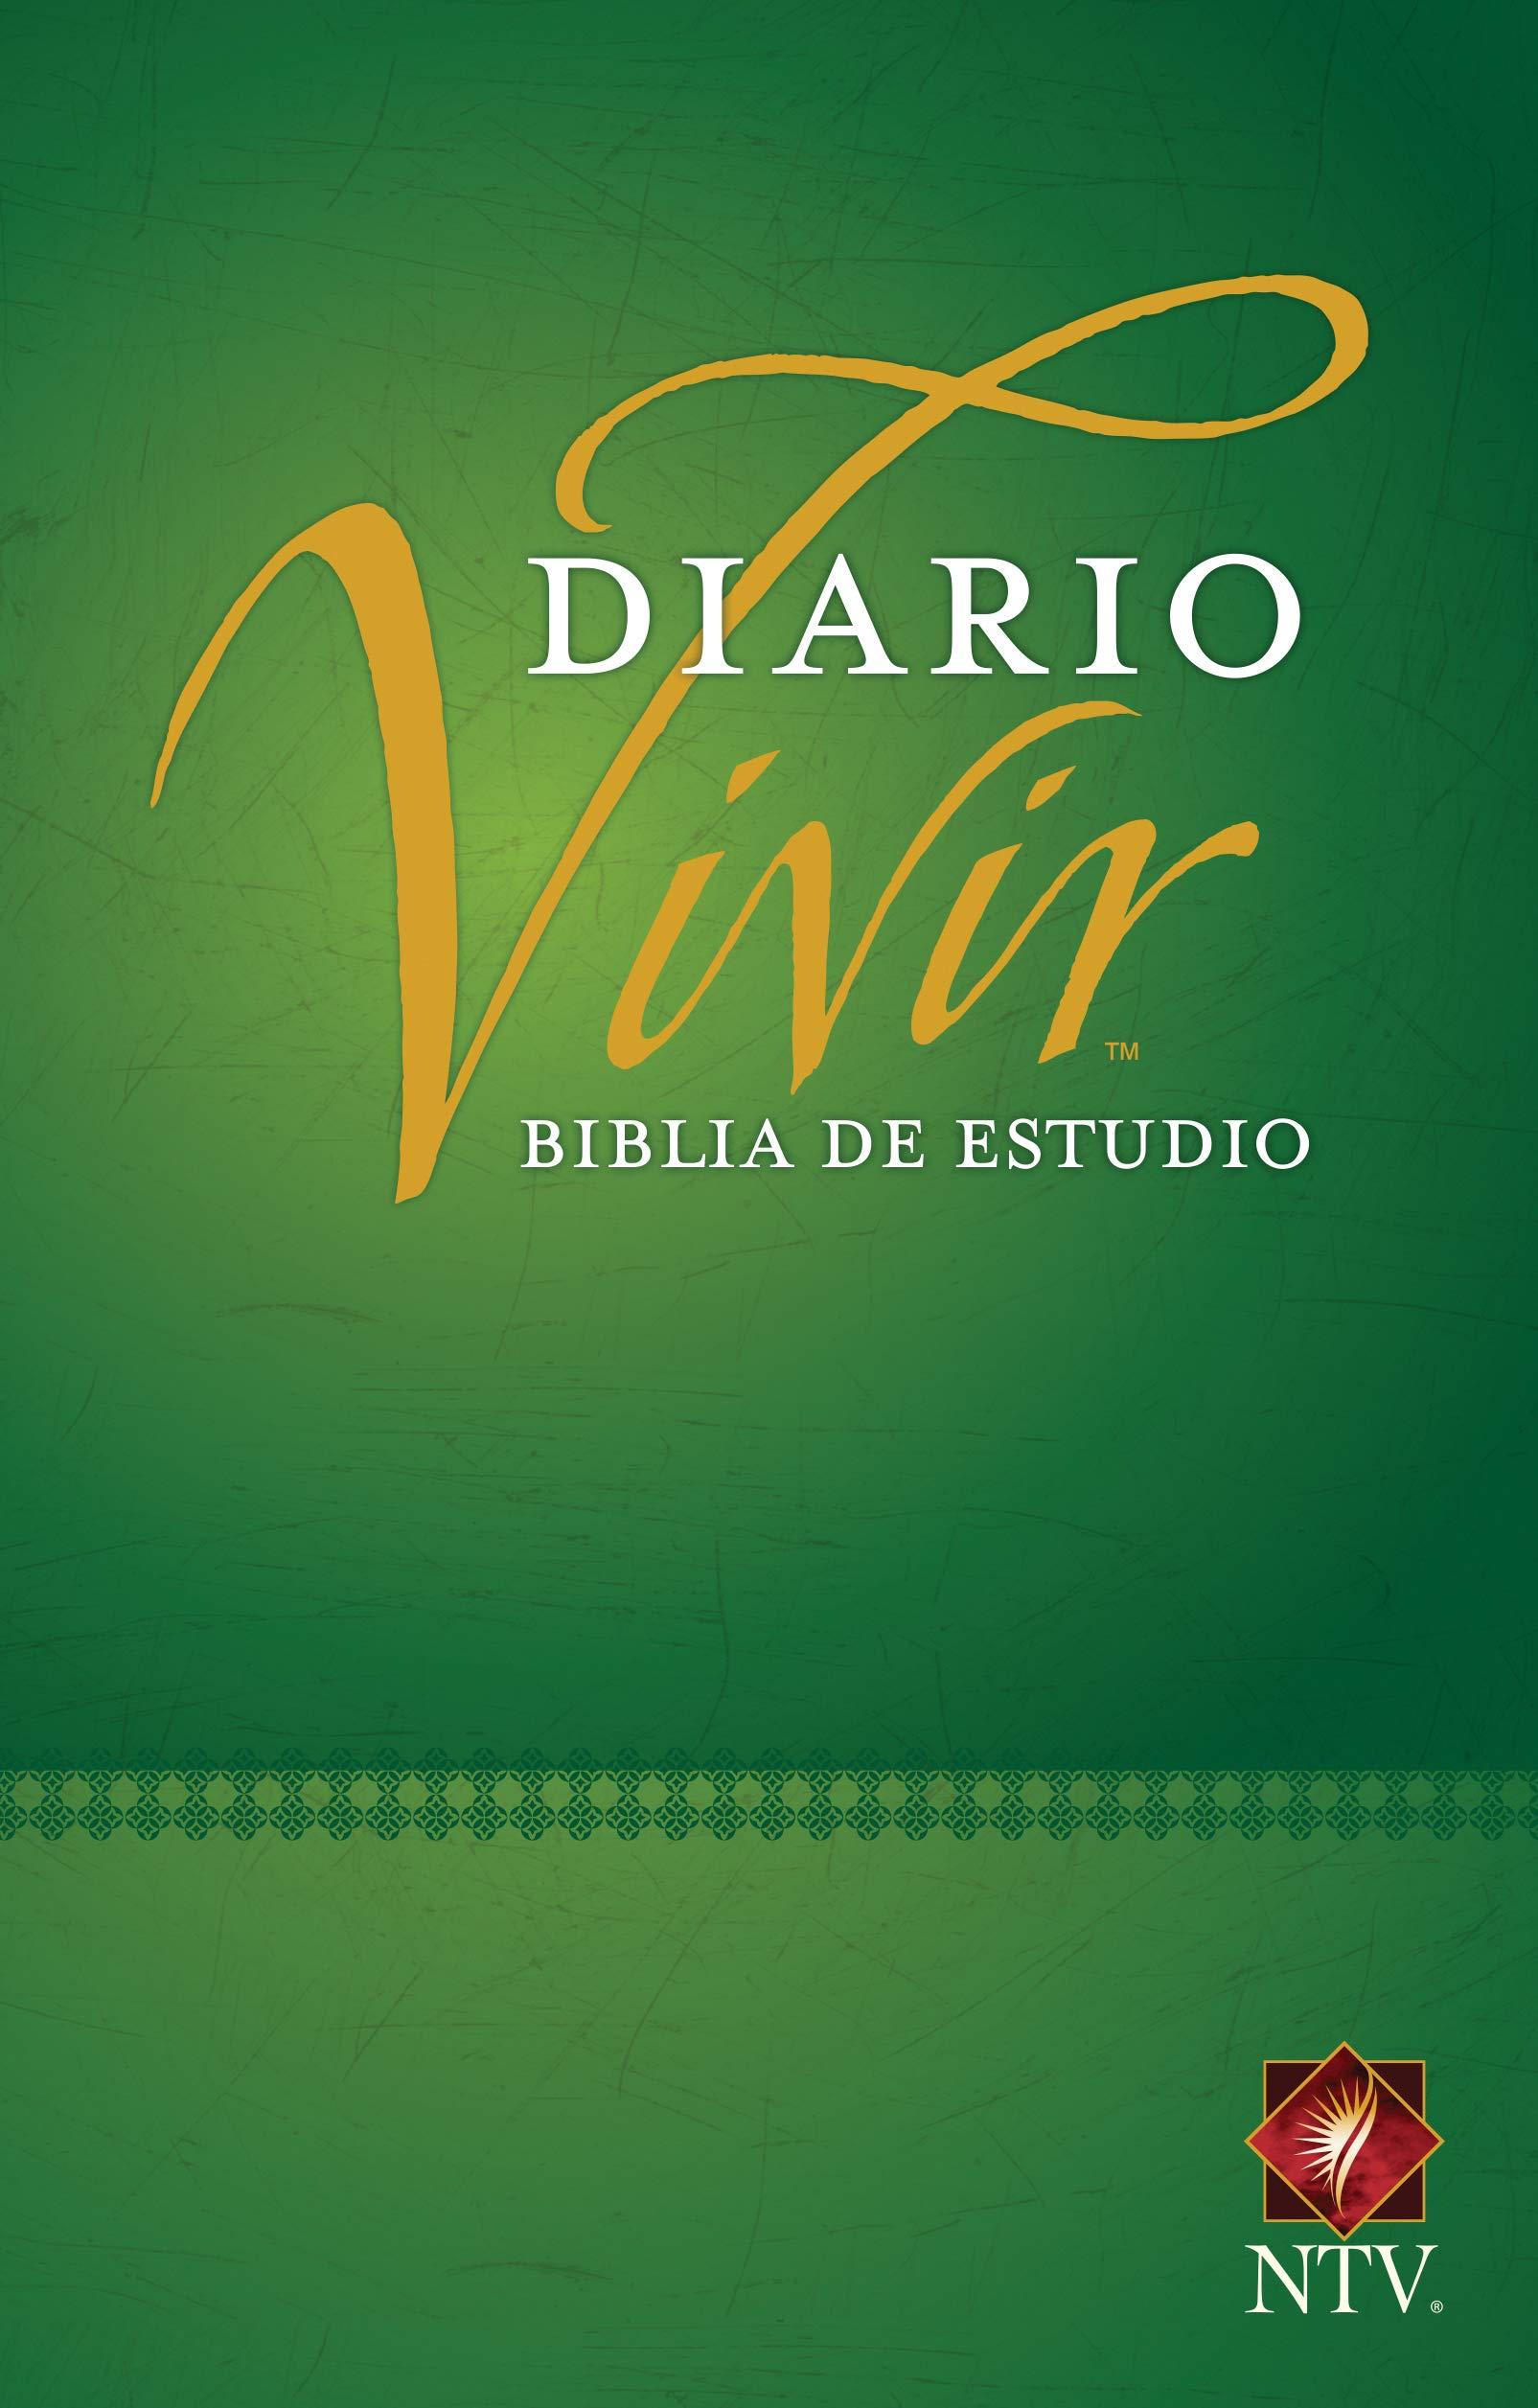 Biblia NTV de Estudio Diario Vivir Tamaño Personal Verde